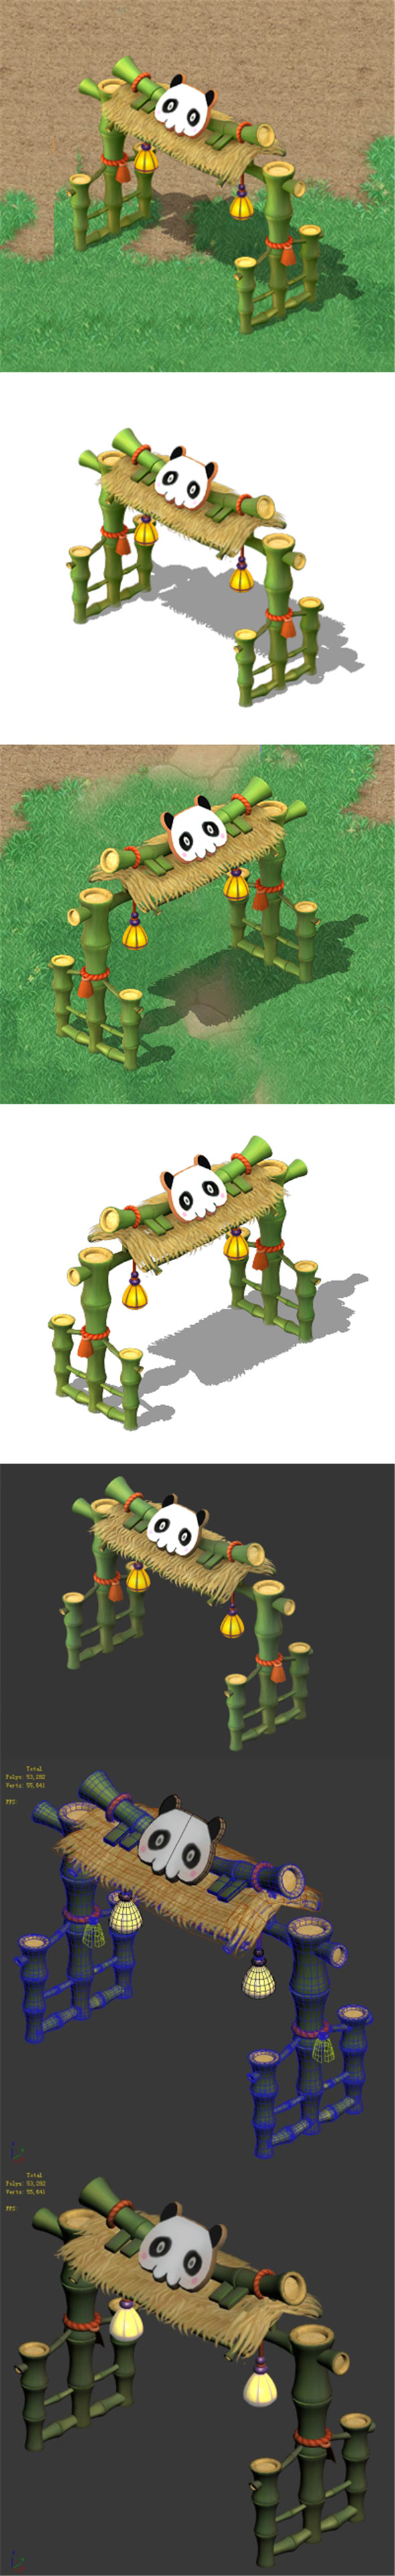 Cartoon World - City Wall 02 - 3DOcean Item for Sale